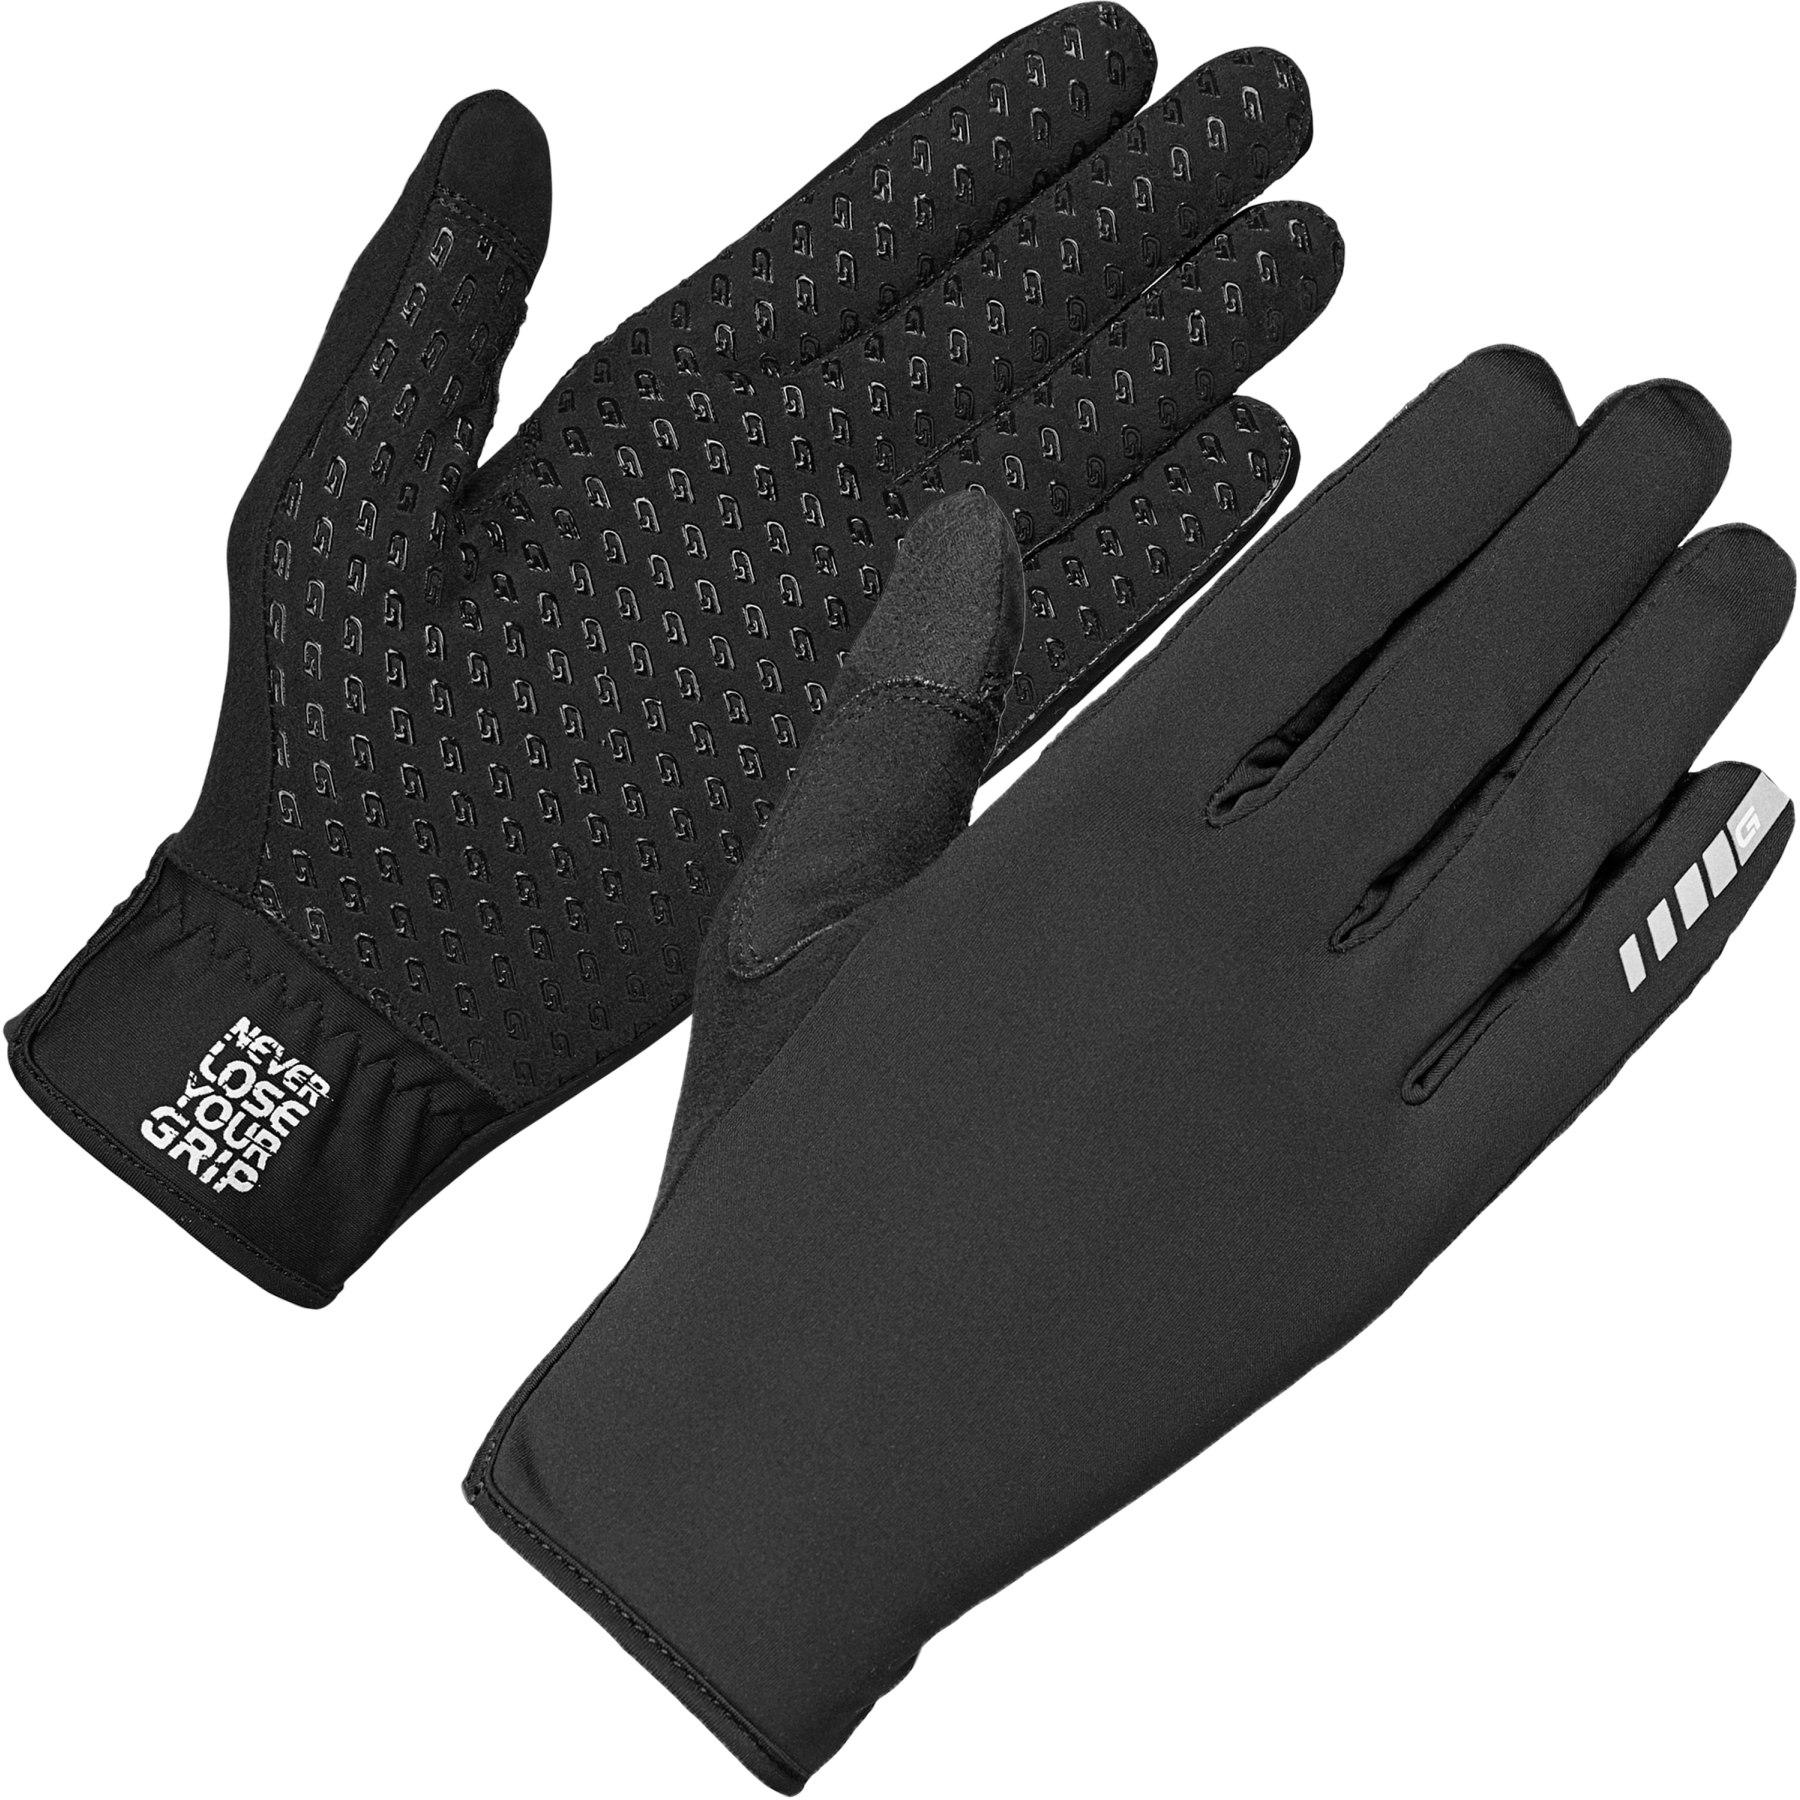 GripGrab Raptor Windproof Lightweight Raceday Winter Glove - Black